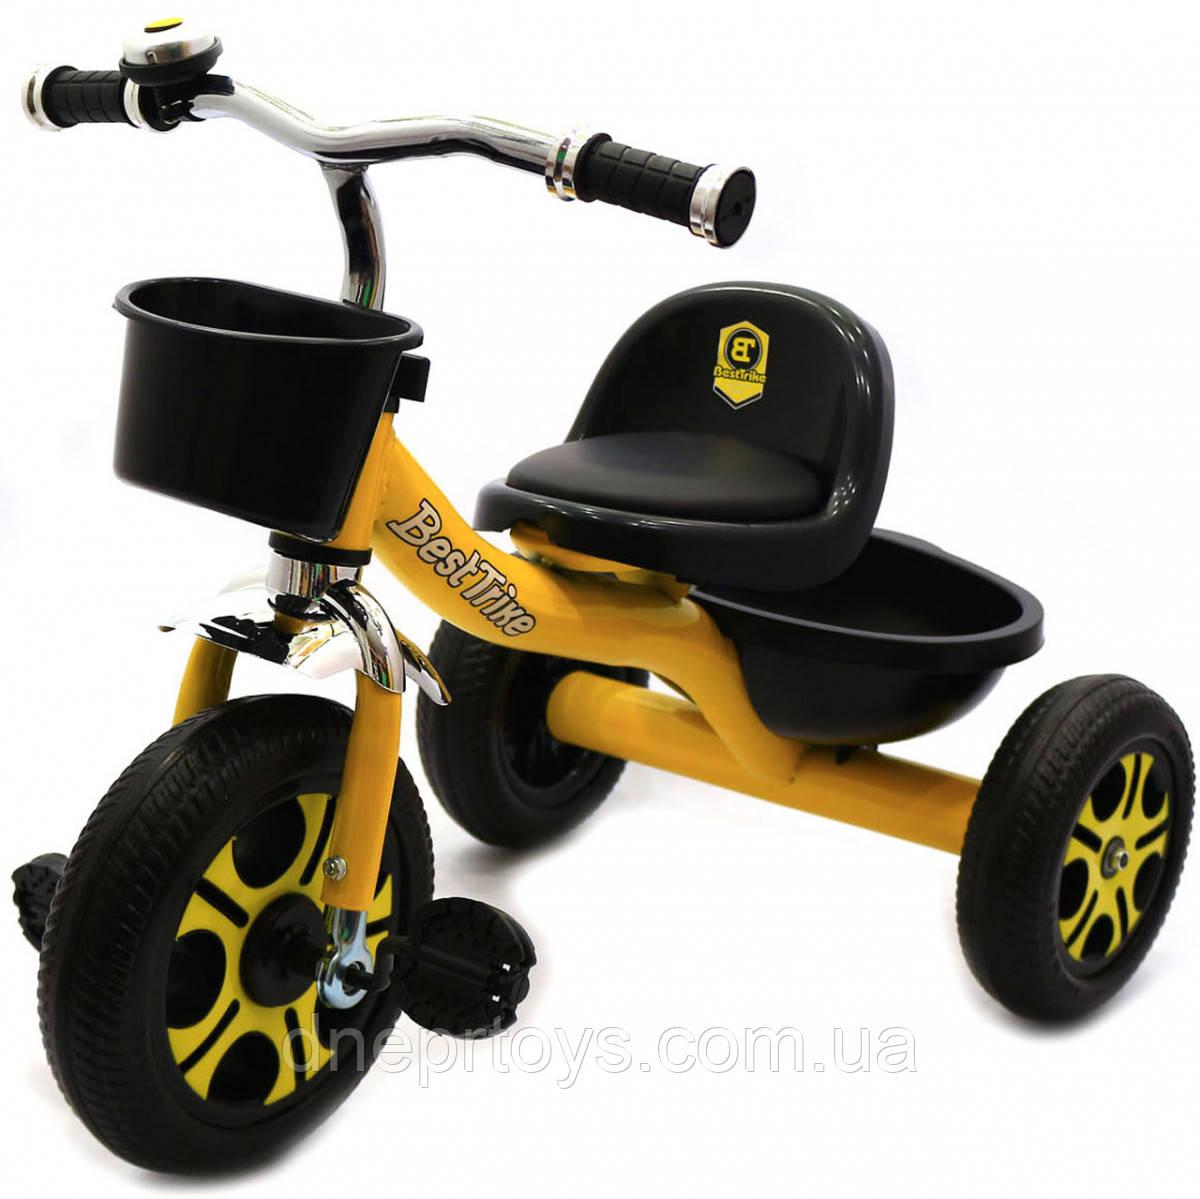 Велосипед детский трёхколёсный Best Trike Желтый (LM-9033)